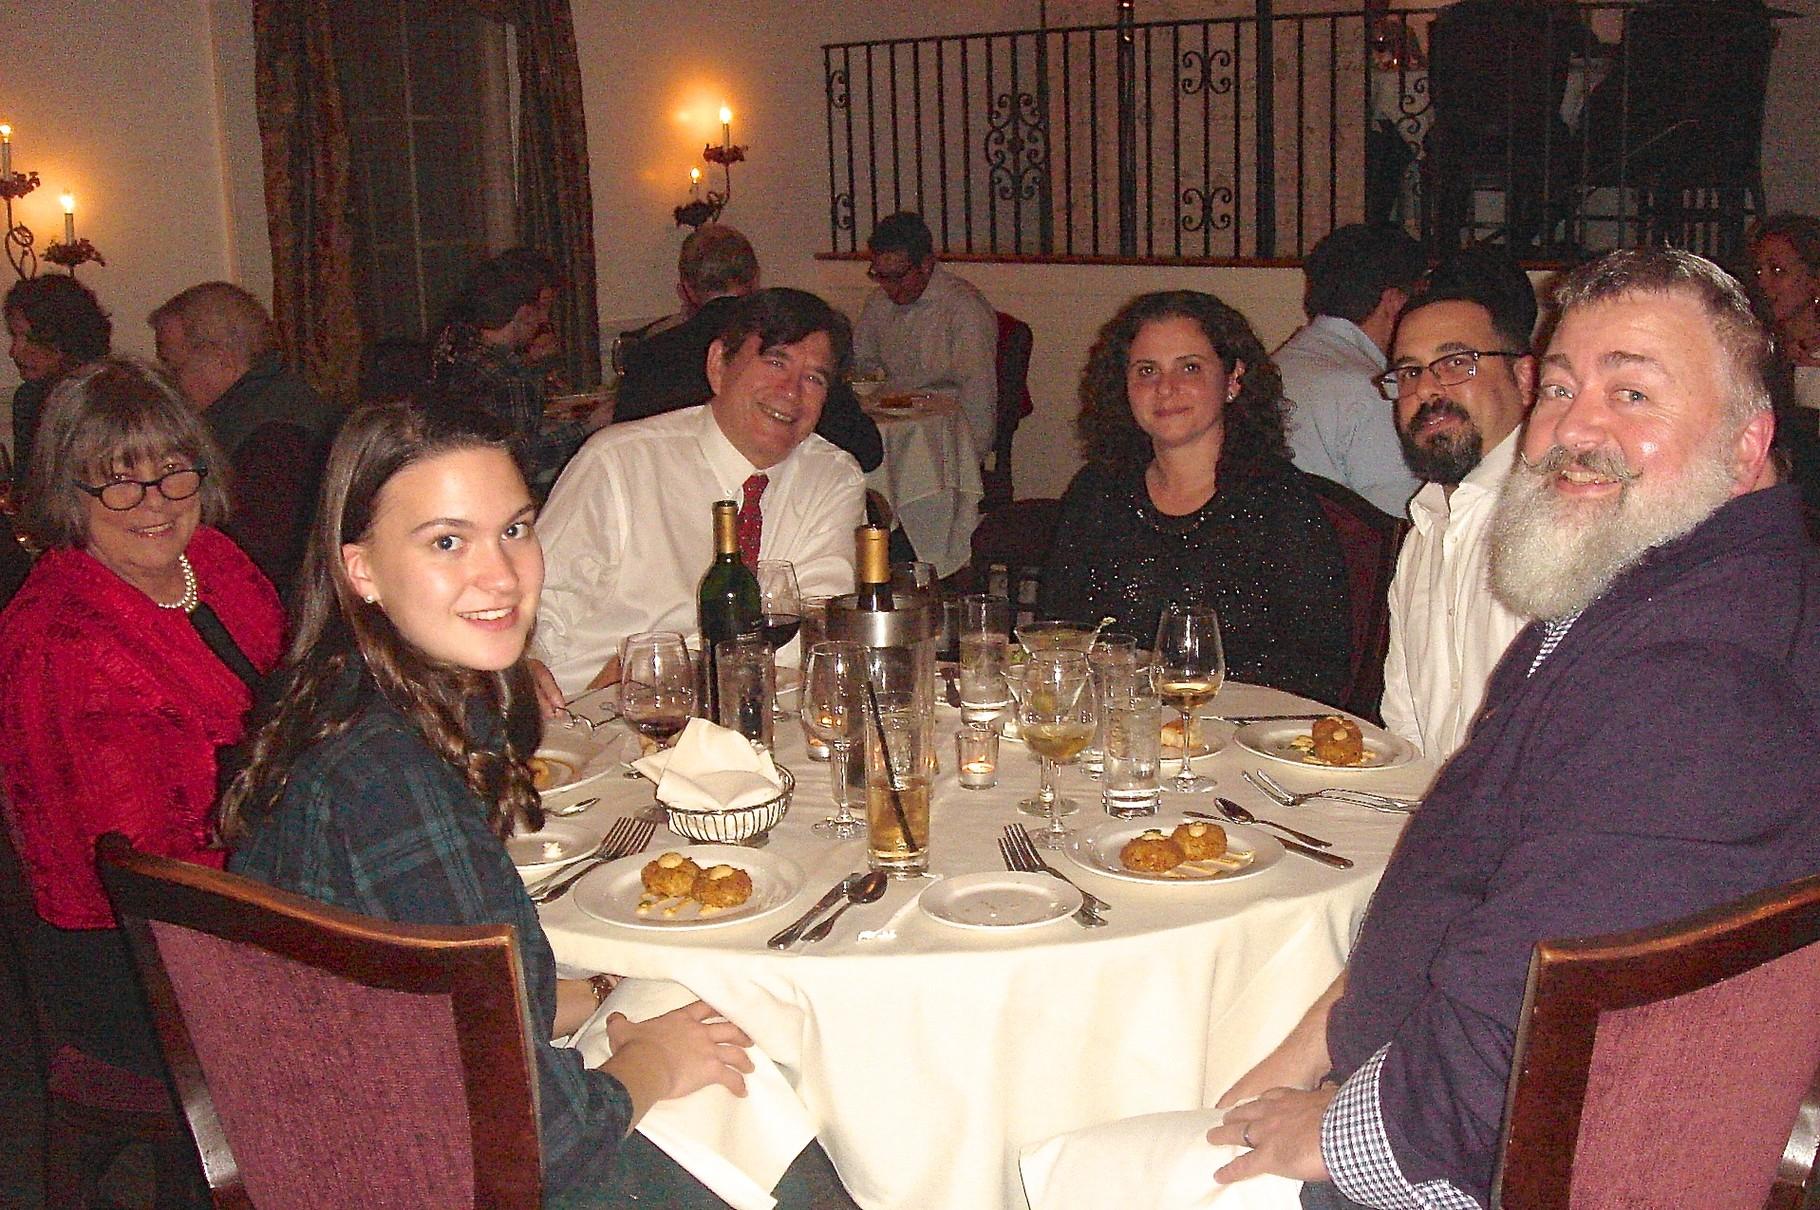 Ellie Kagel, Kathy Hutchins, John, Bevin's wife?, Colin Cherot, Matt